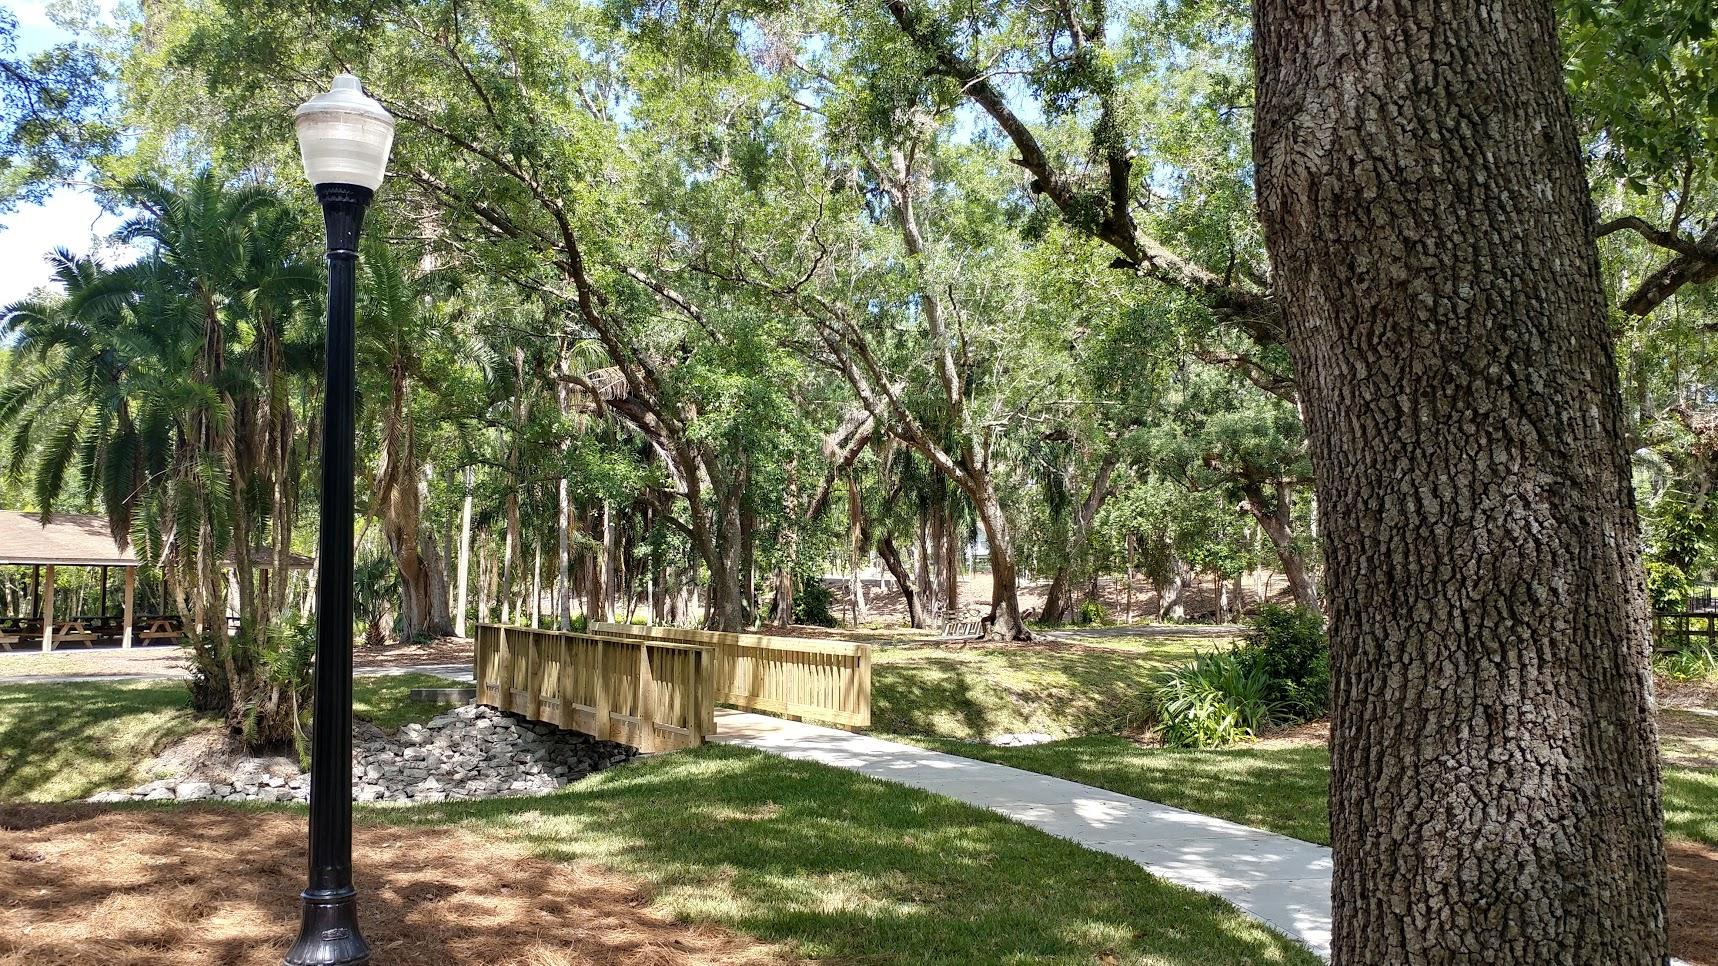 City of Orlando Langford Bridge